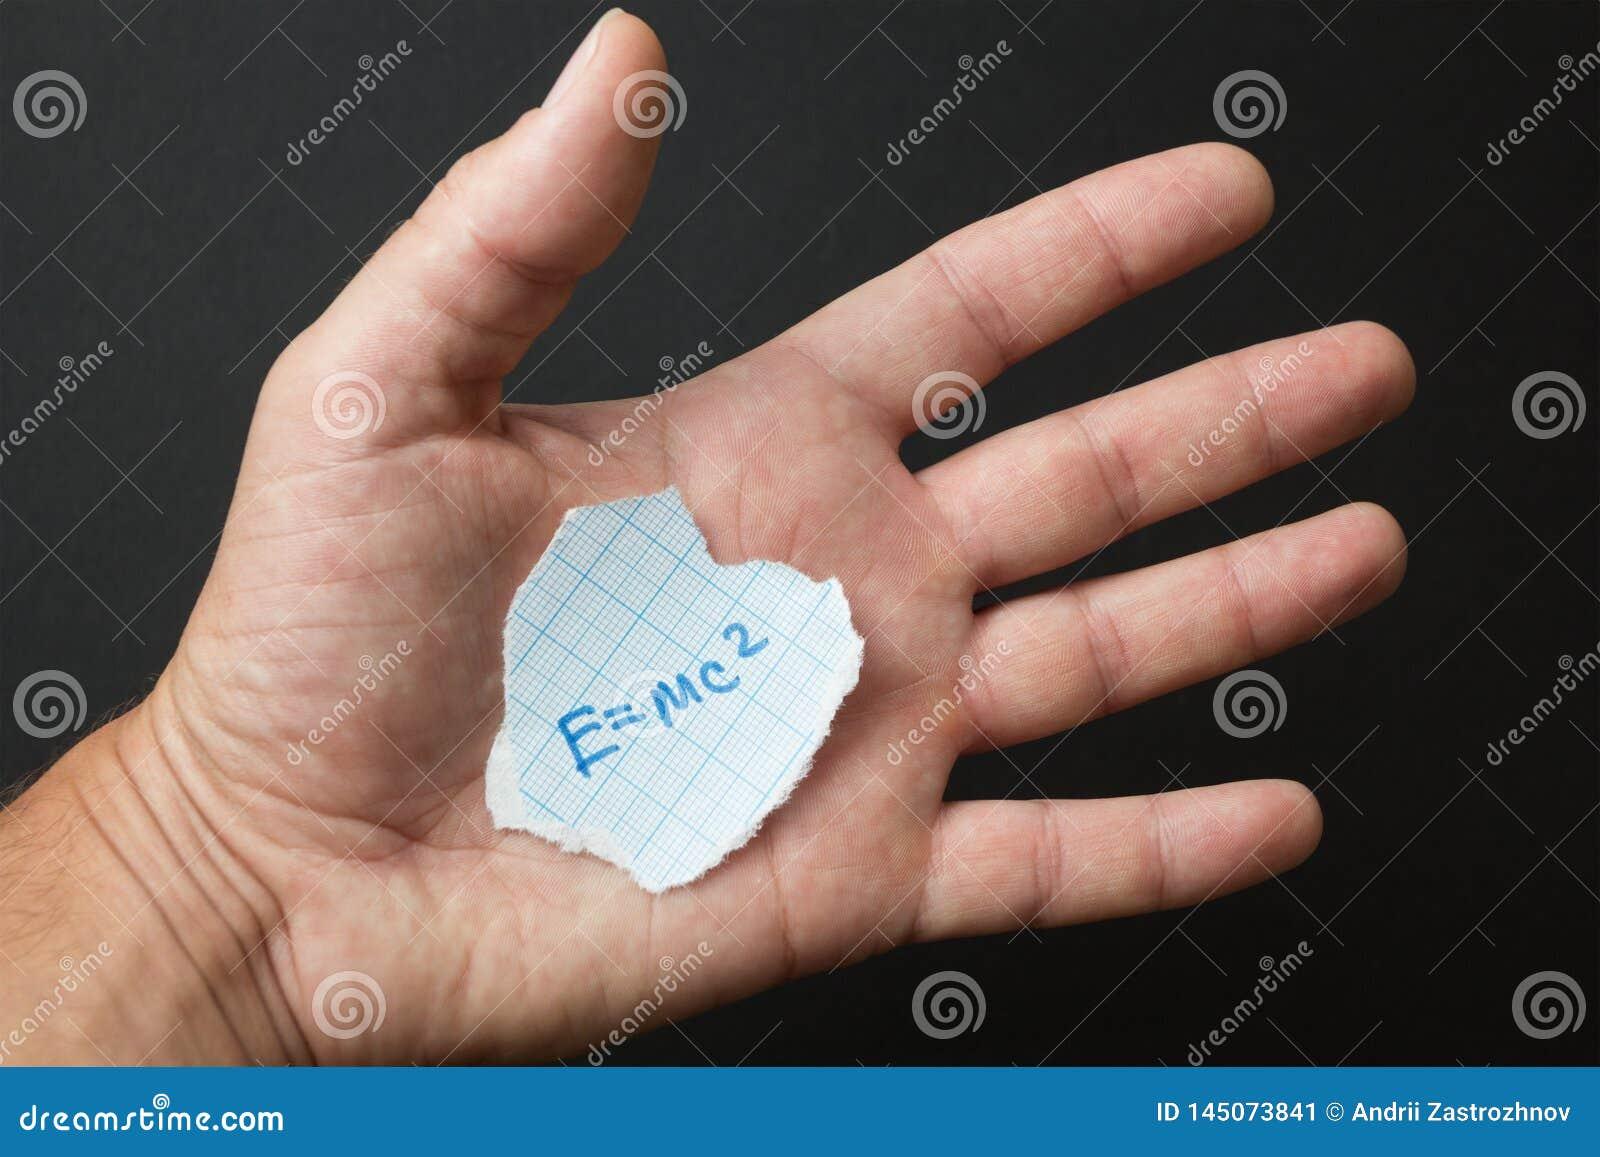 Формула e = mc2 в руке